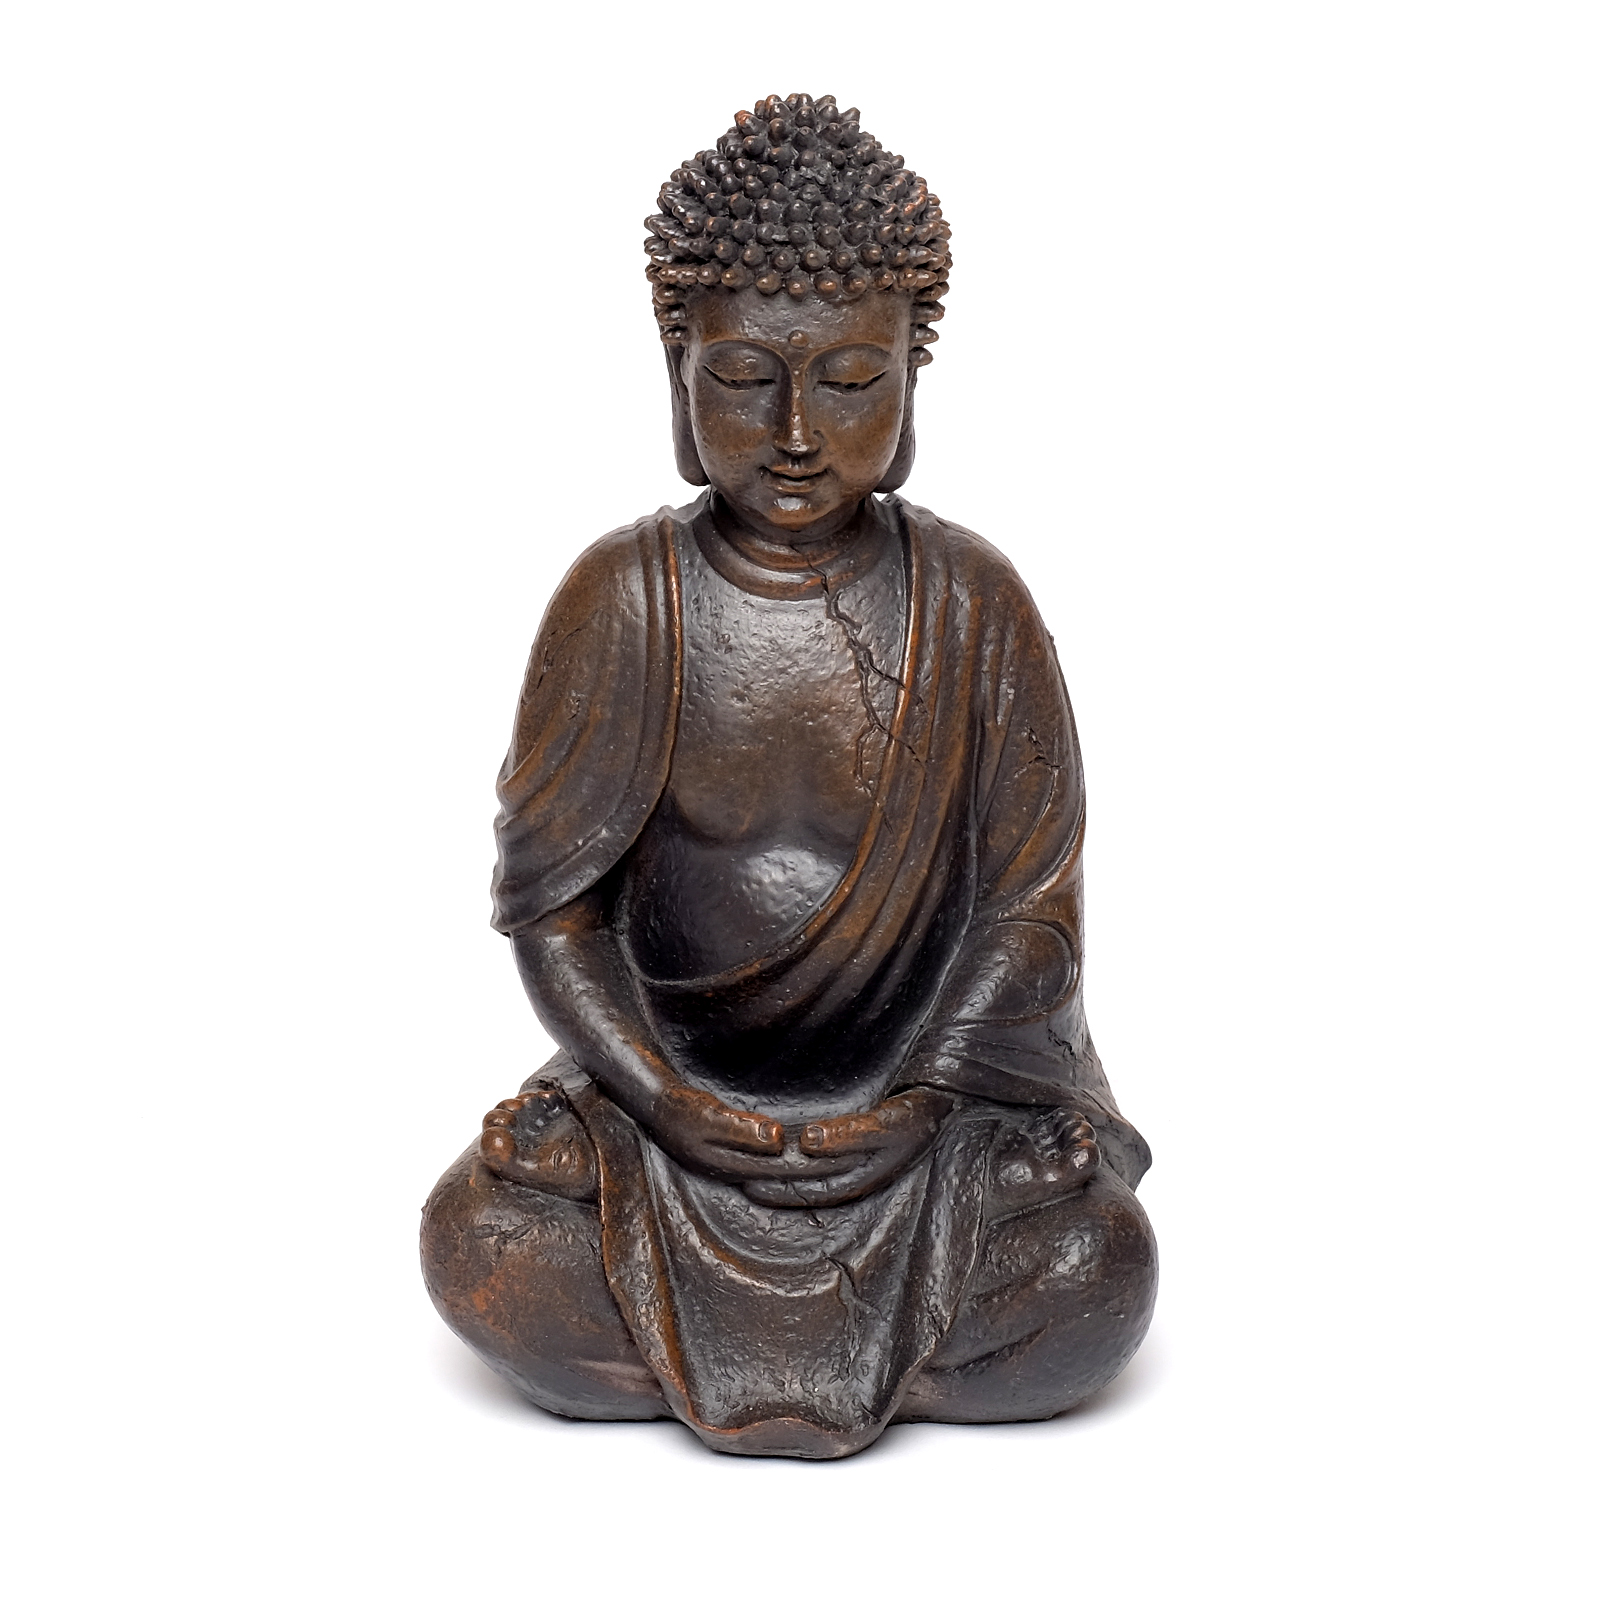 thai buddha figur statue dekoration vintage schlafzimmer. Black Bedroom Furniture Sets. Home Design Ideas